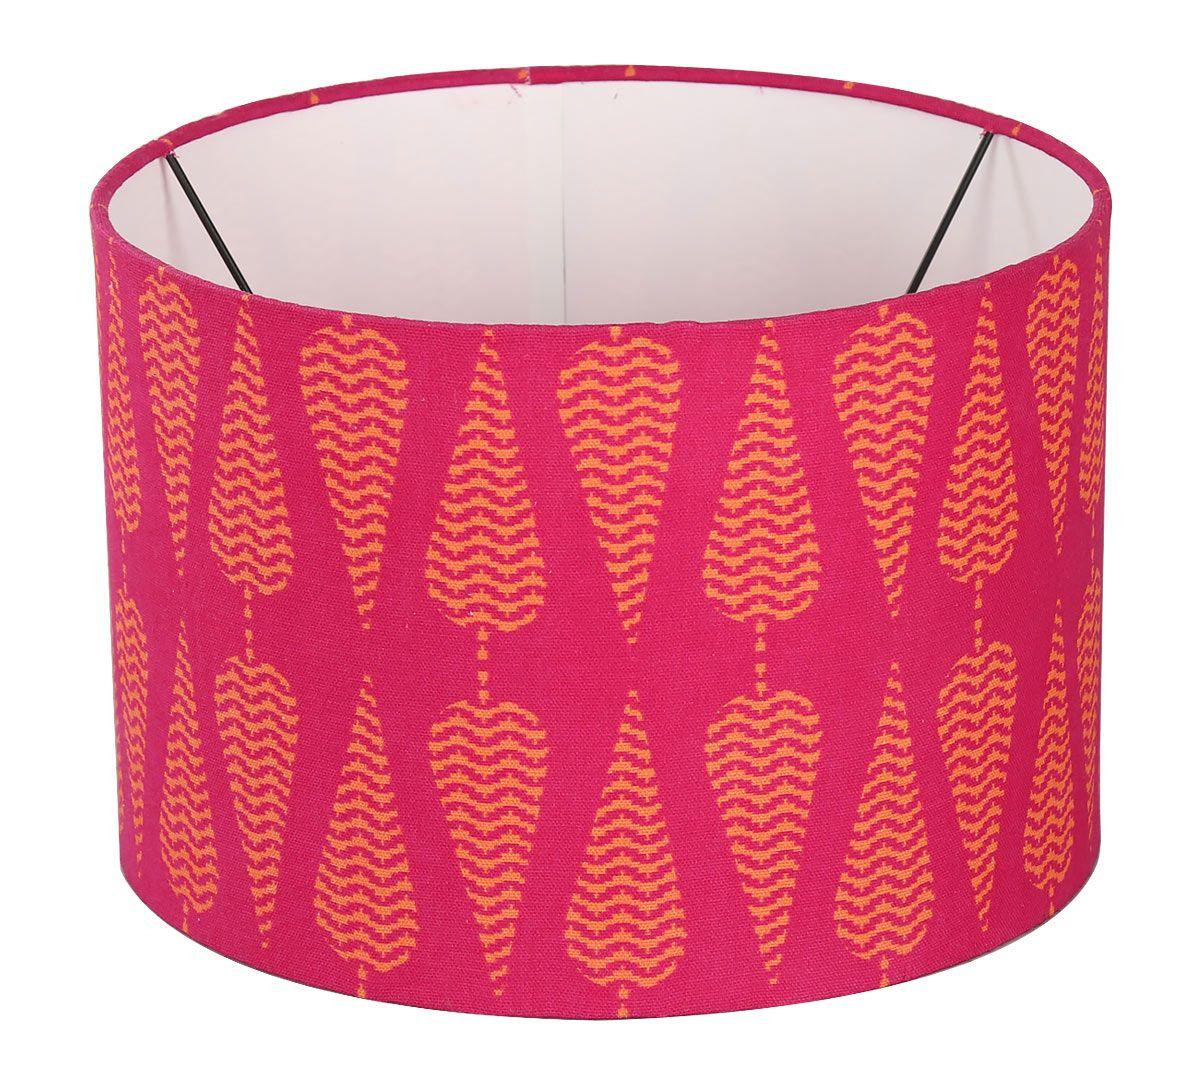 India Circus Conifer Spades Cylindrical Lamp Shade